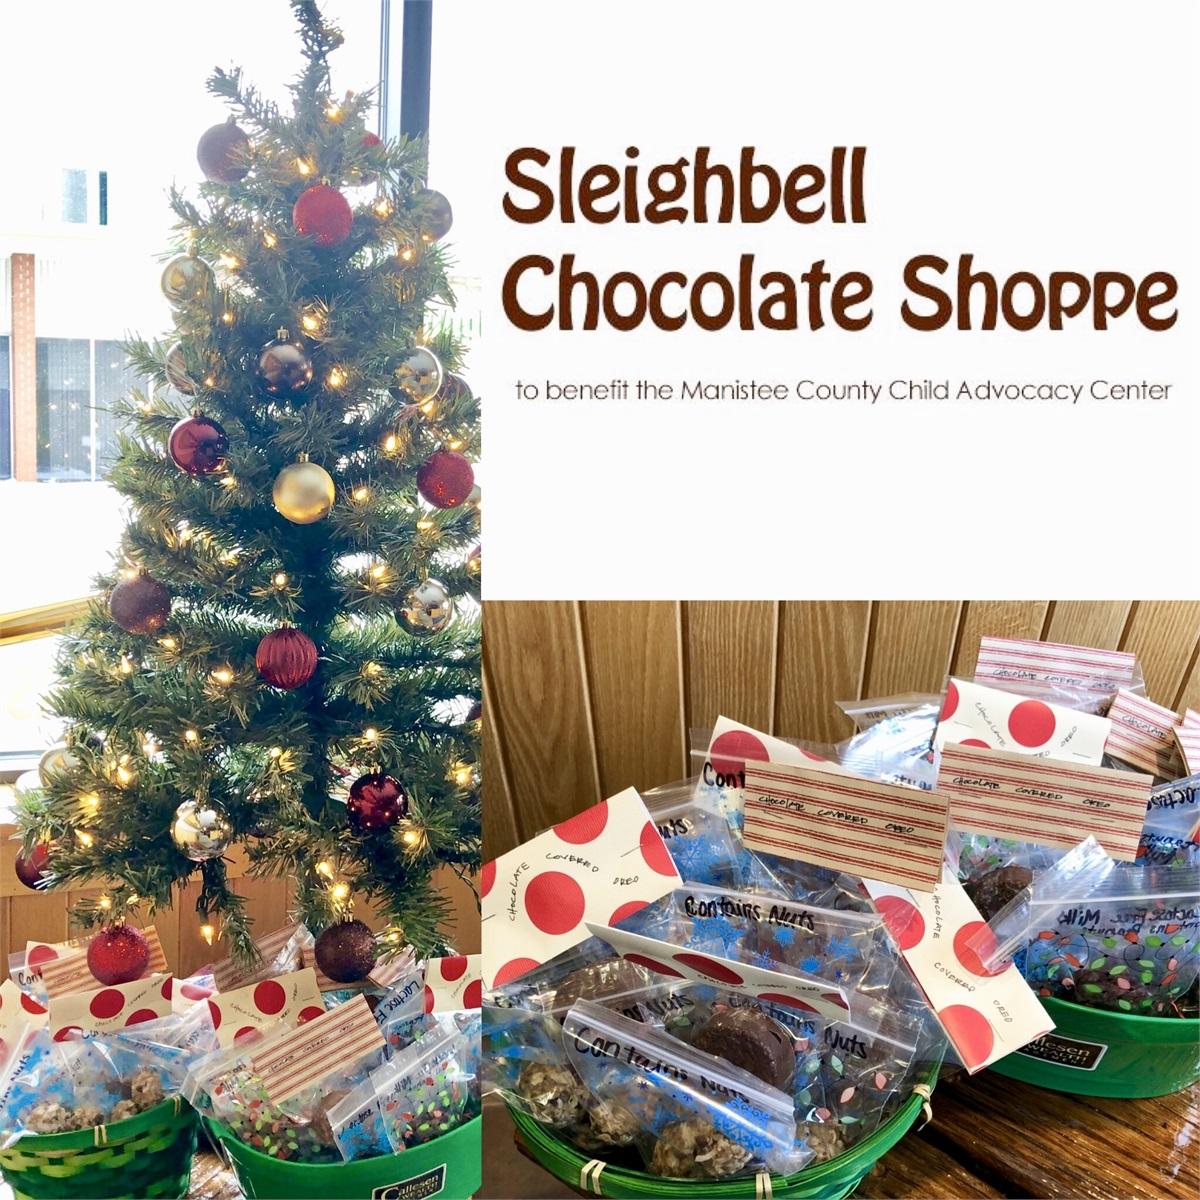 Sleighbell Chocolate Shoppe Grand Rapids, MI Callesen Wealth Management